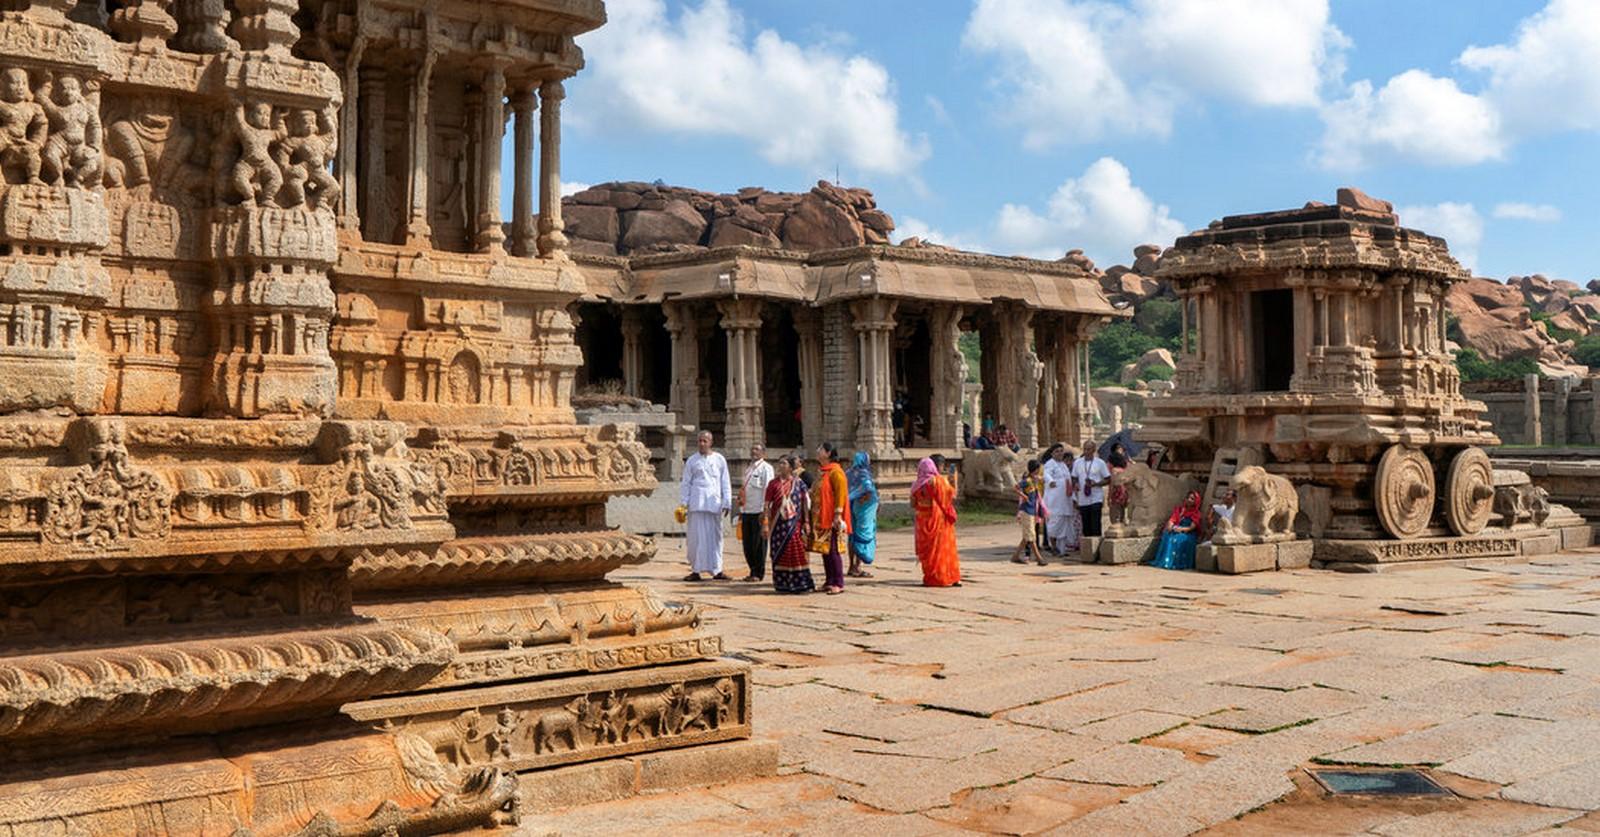 Ruins of the Vijayanagara Empire, Hampi, Karnataka- Sheet2